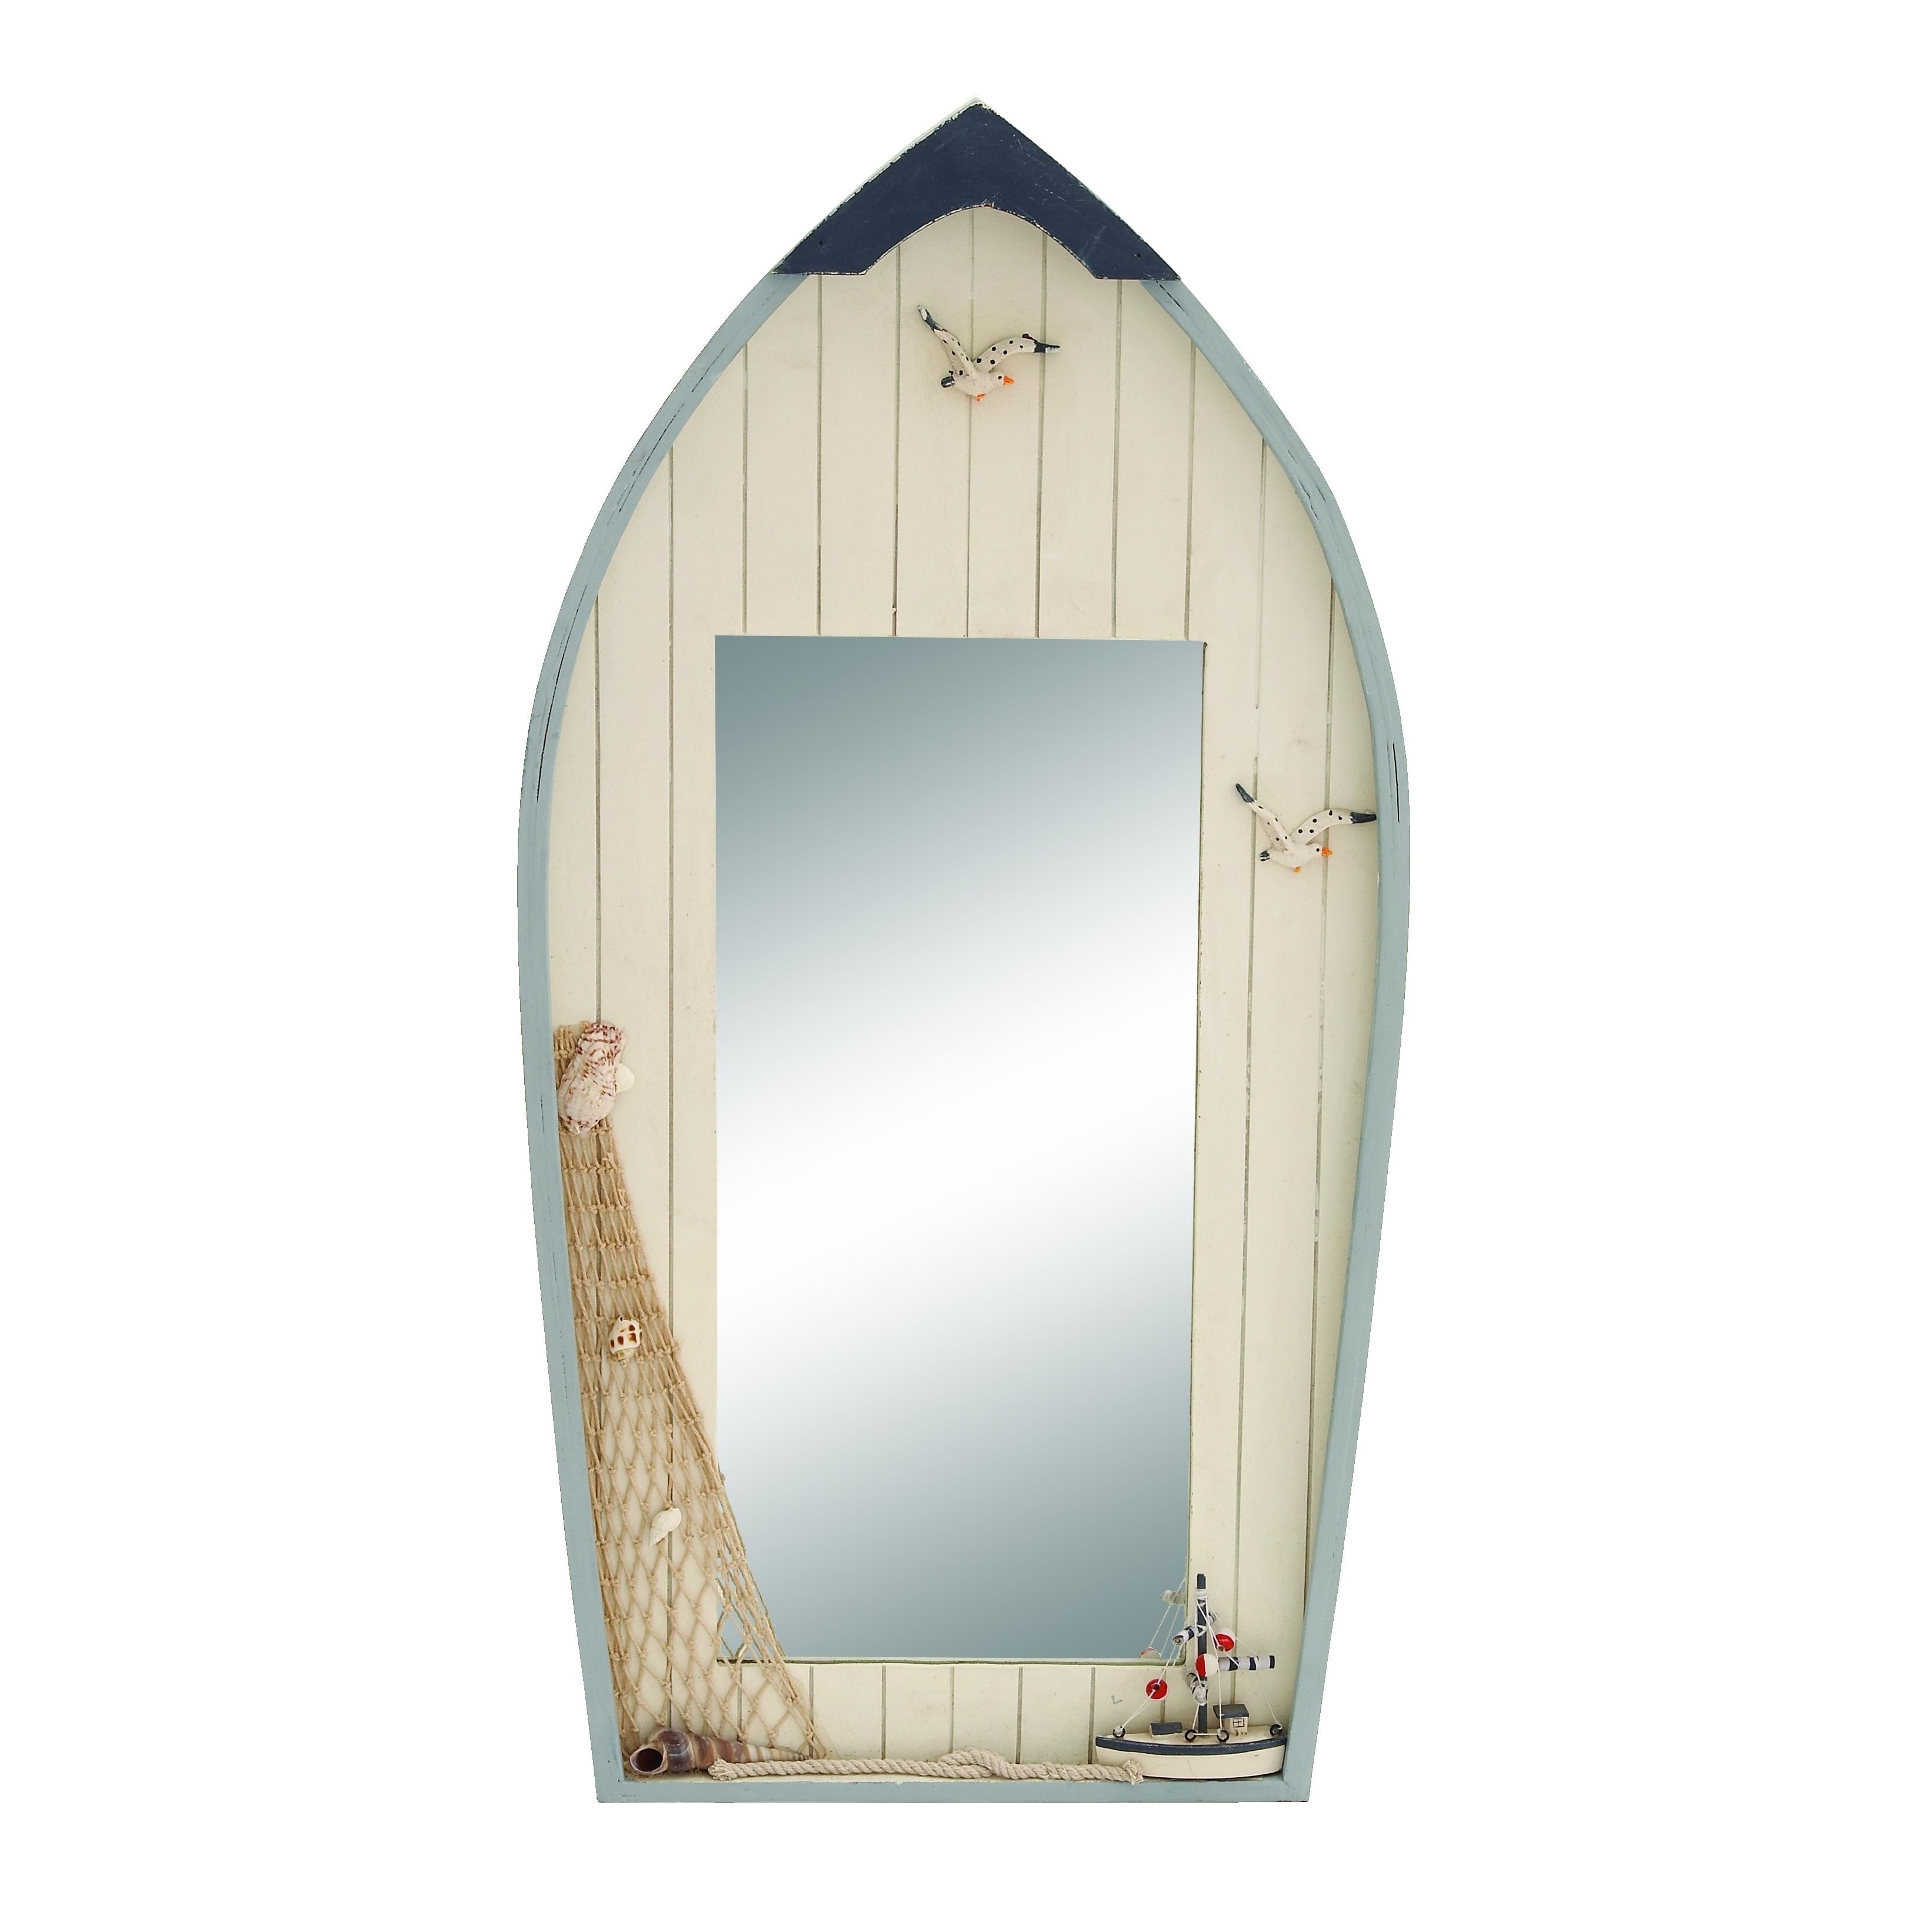 Shop Seaside Nautical Row Boat Mirror Decor With Fishing Net - On ...